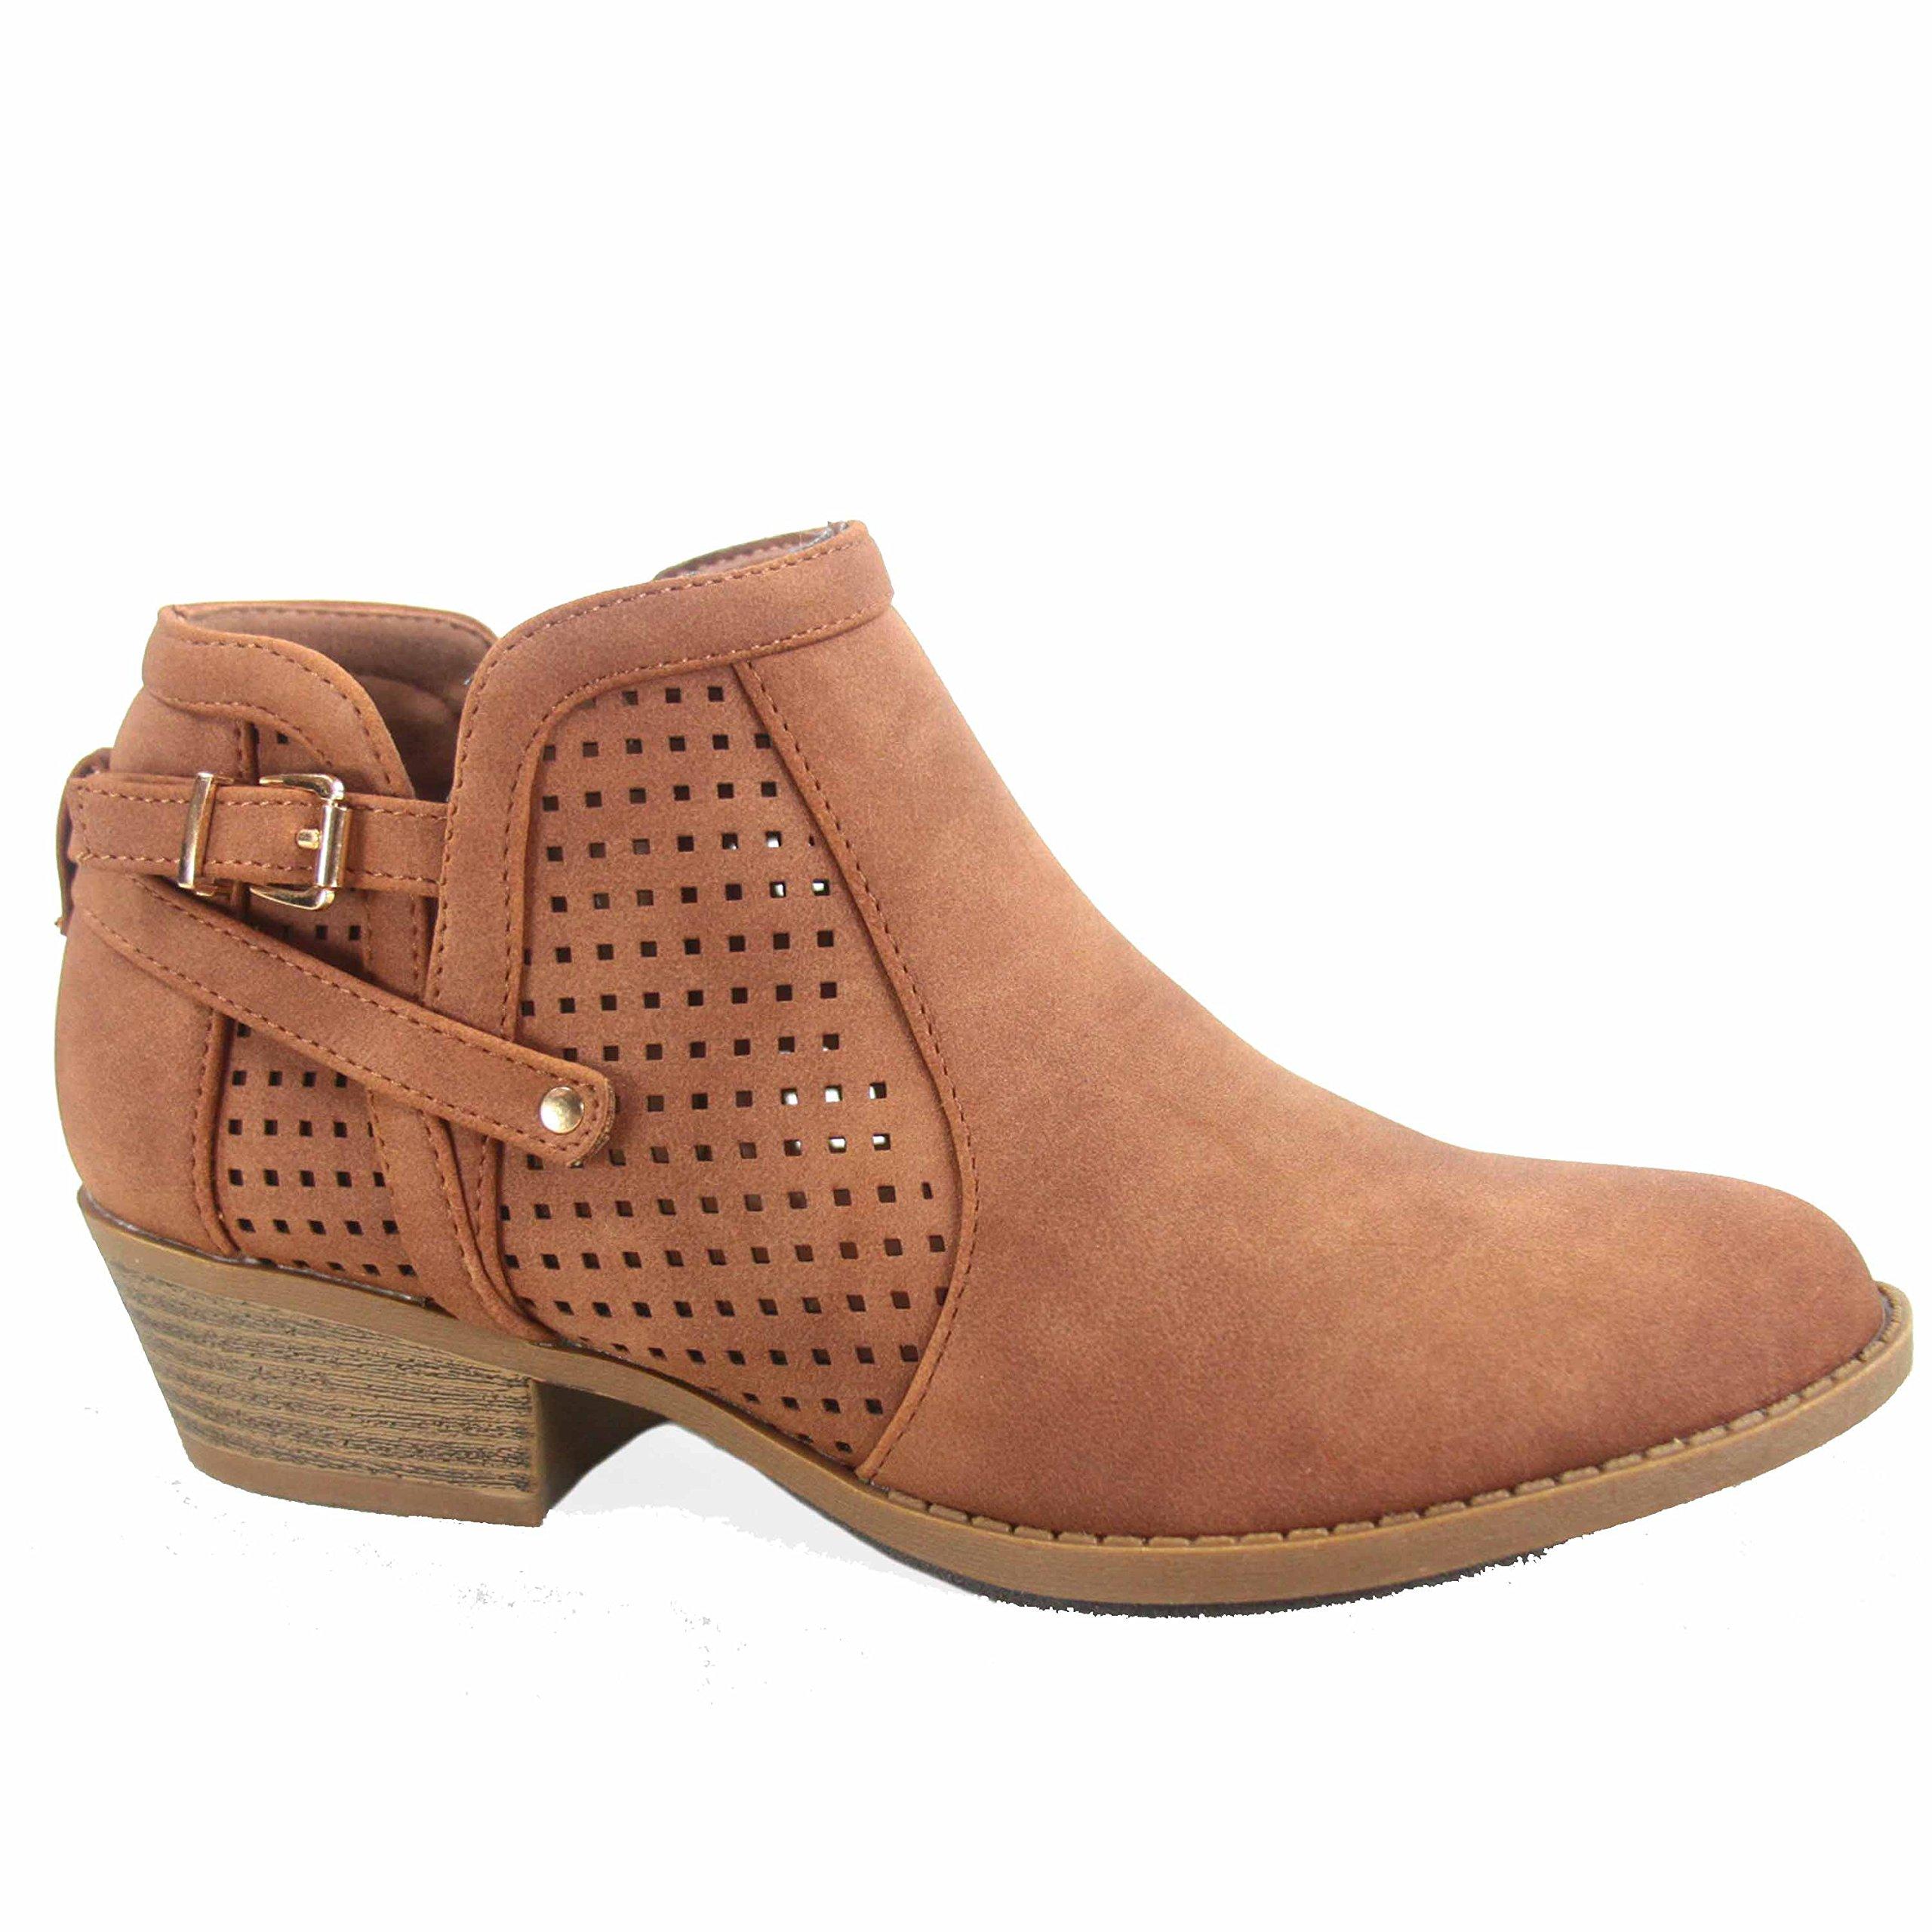 Top Moda Chevy-38 Women's Stylish Almond Toe Buckle Zipper Low Heel Booties Shoes (9 B(M) US, Tan)